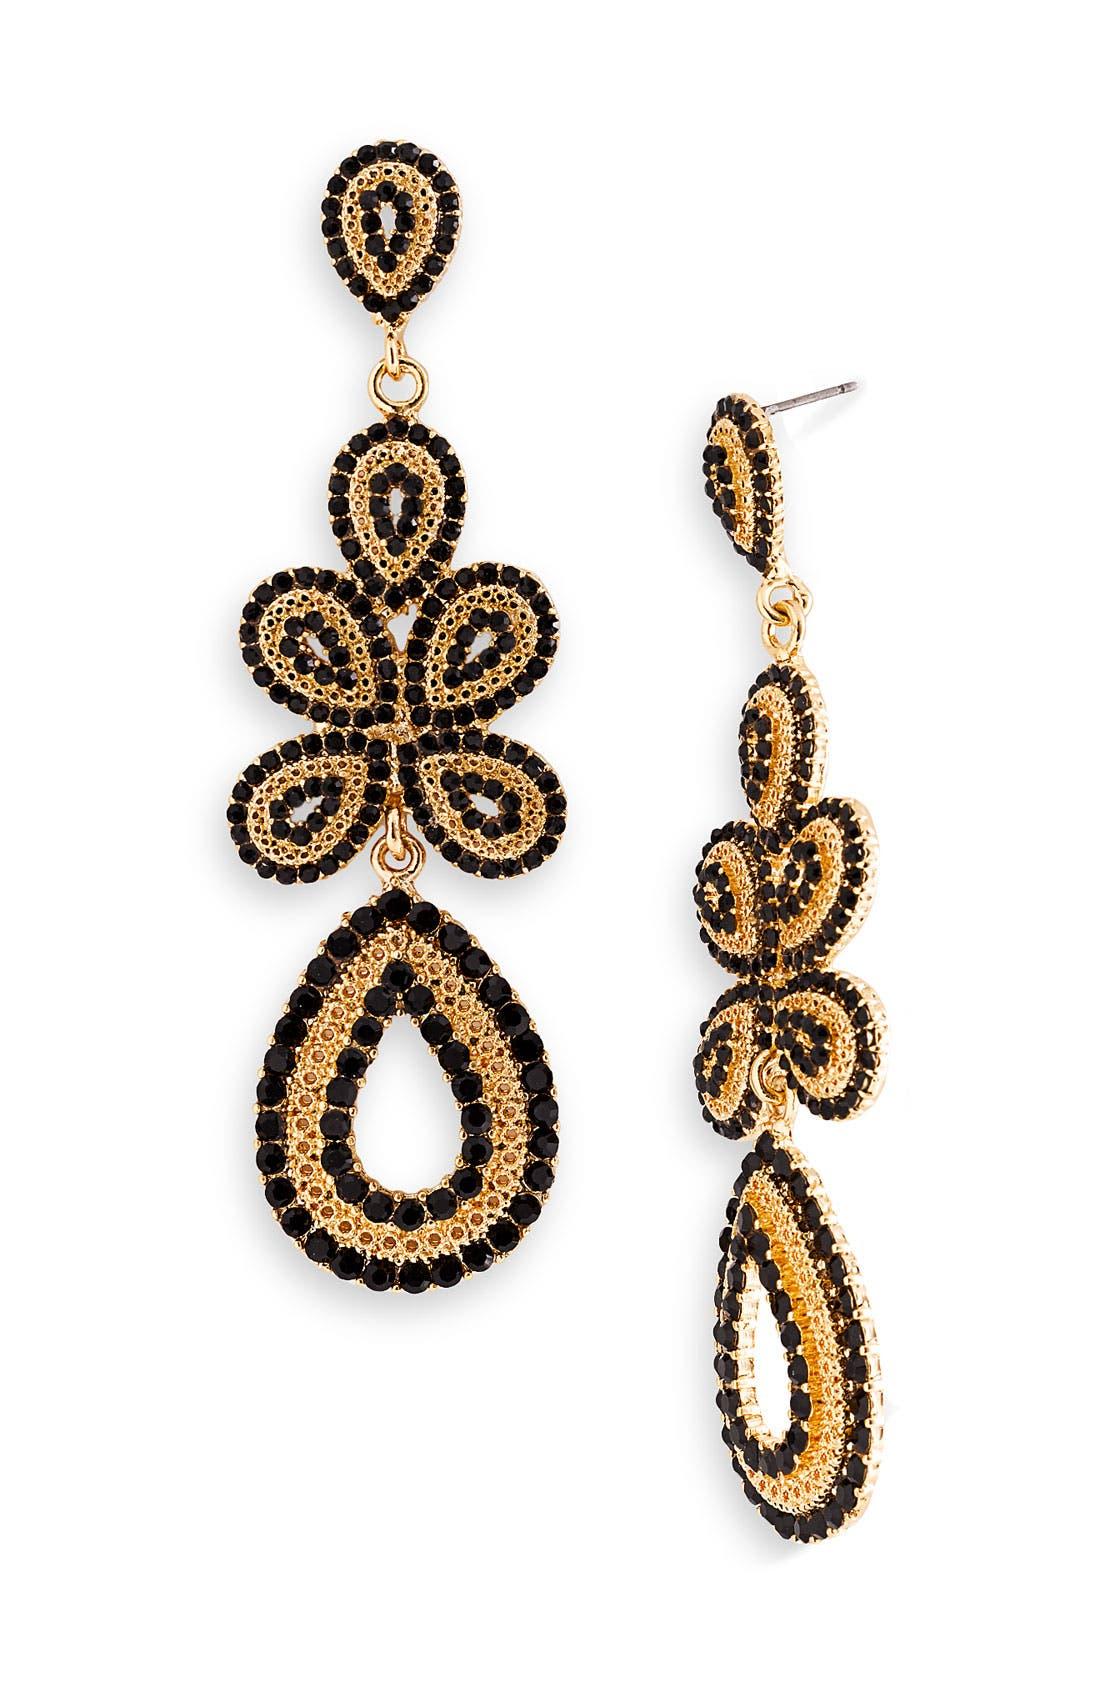 Alternate Image 1 Selected - Tasha 'Ornate' Linear Statement Earrings